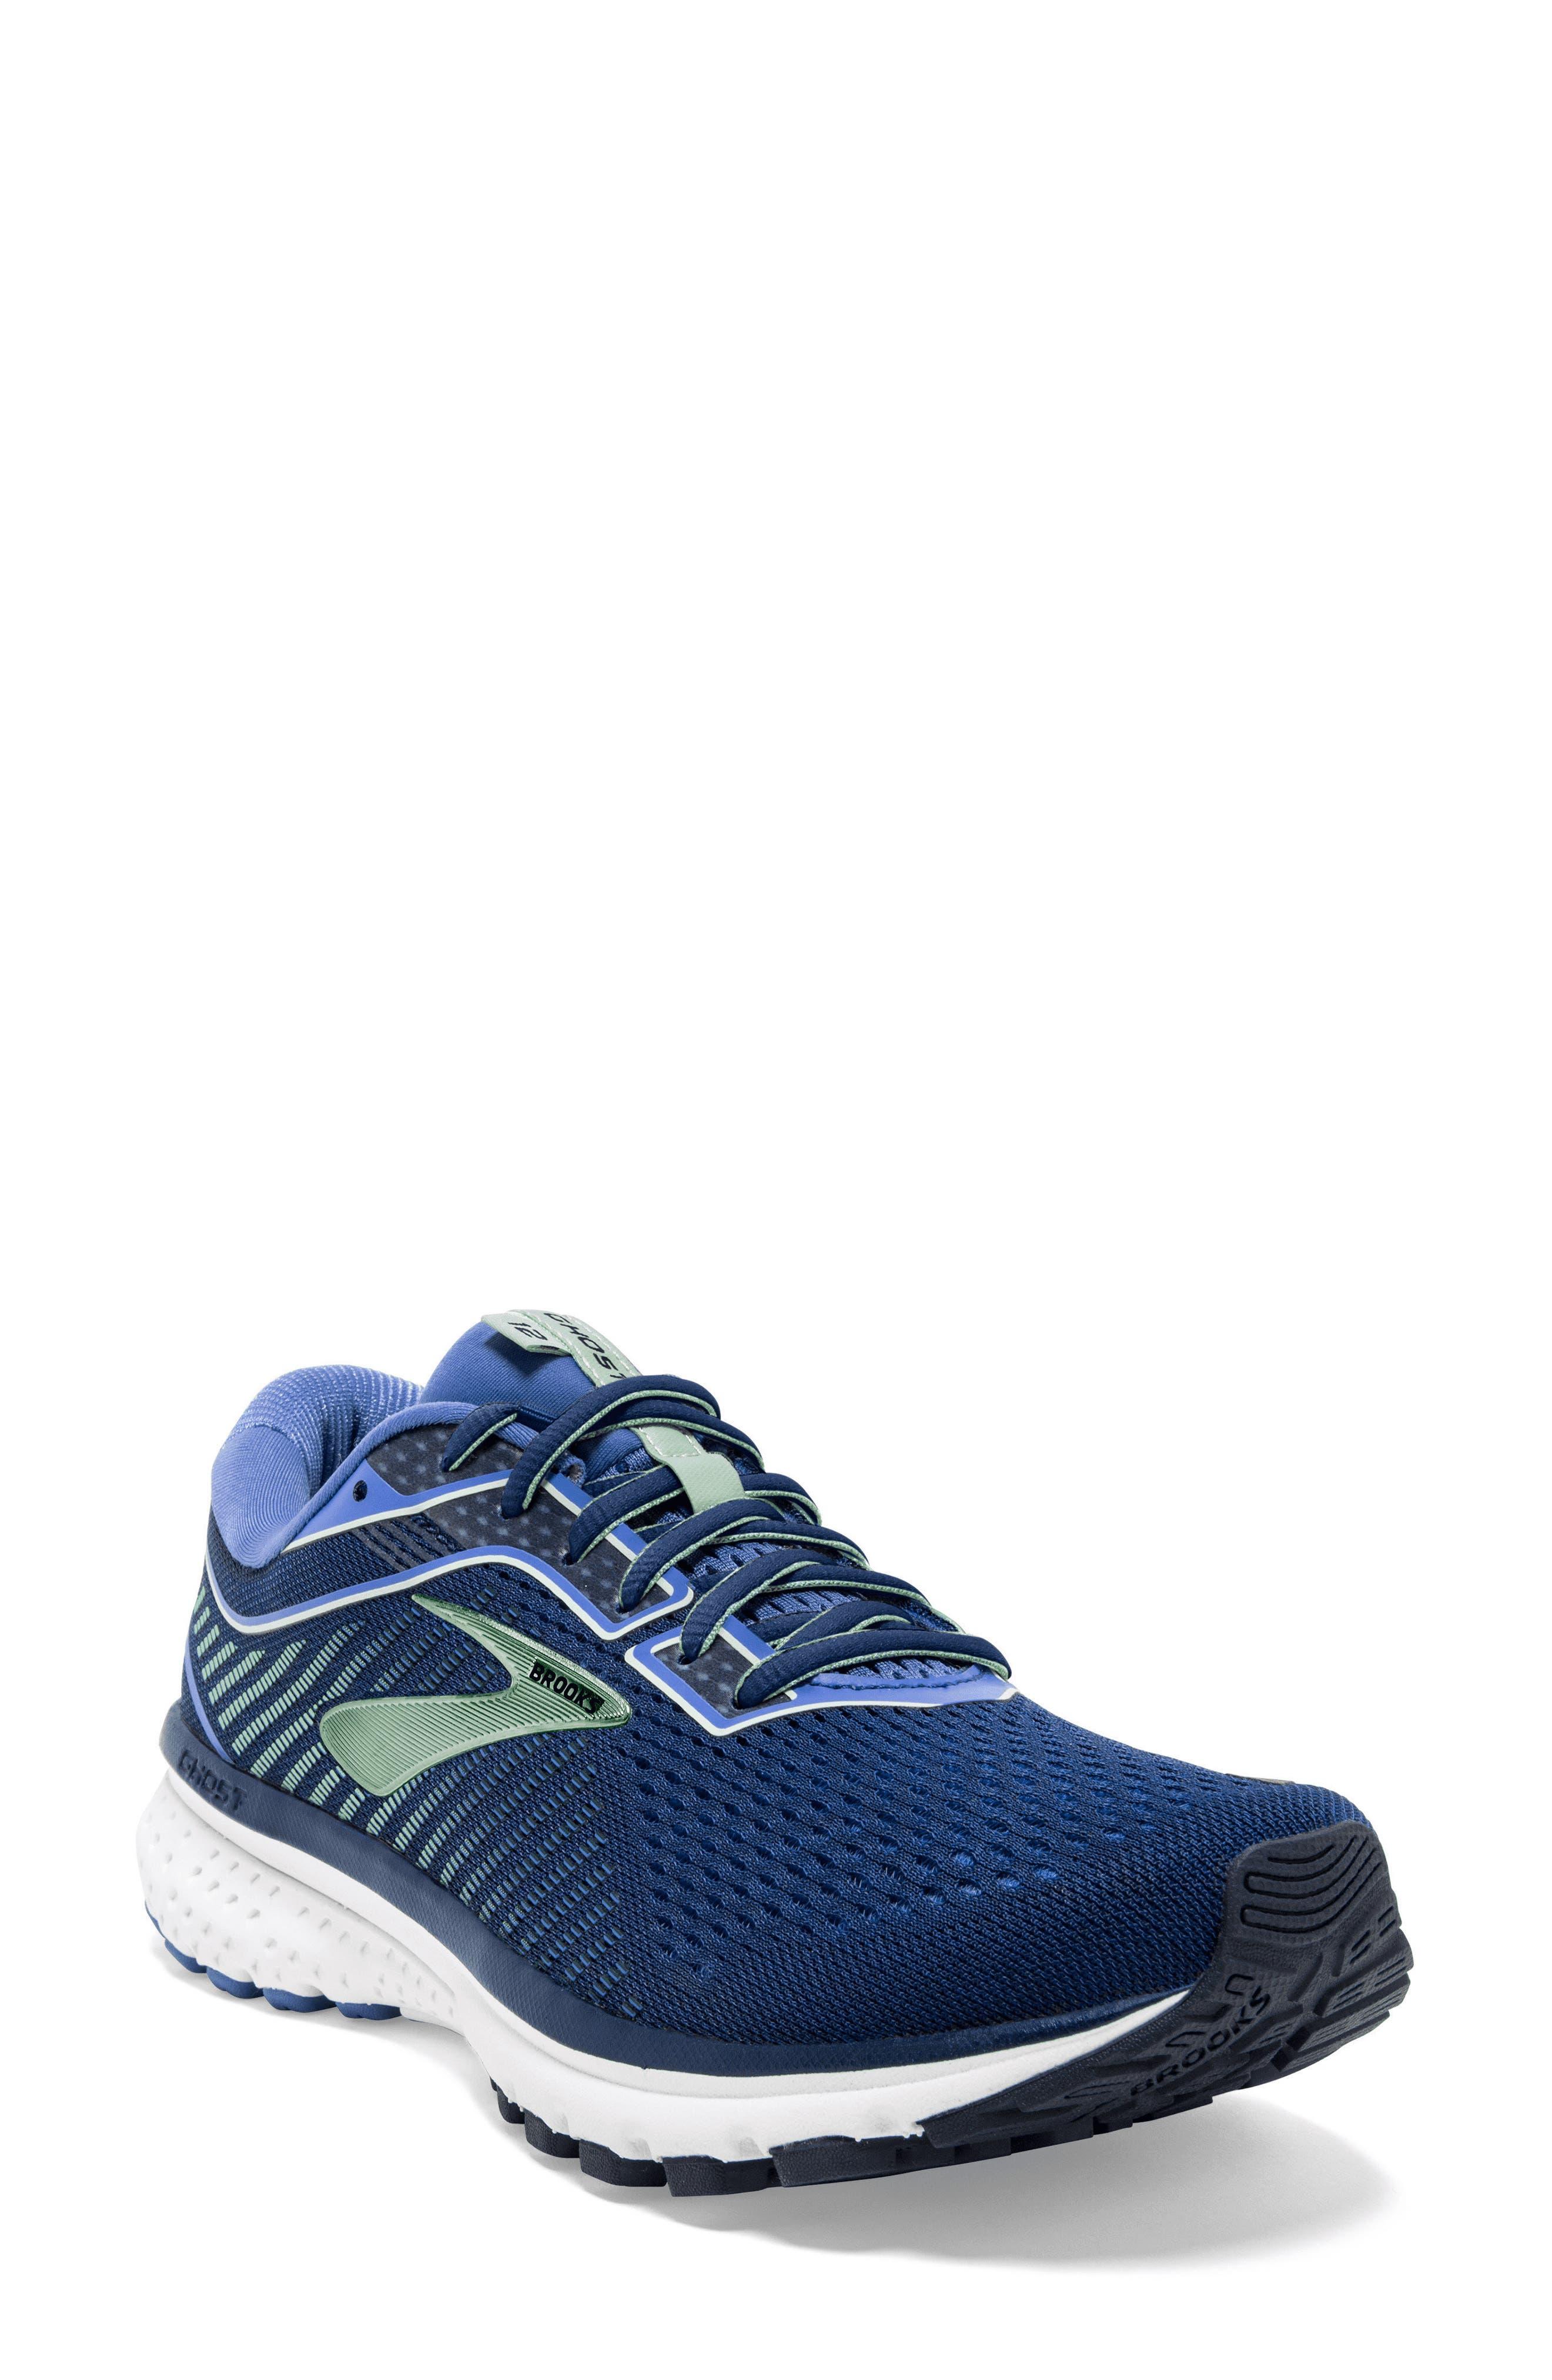 Brooks | Ghost 12 Running Shoe - Wide